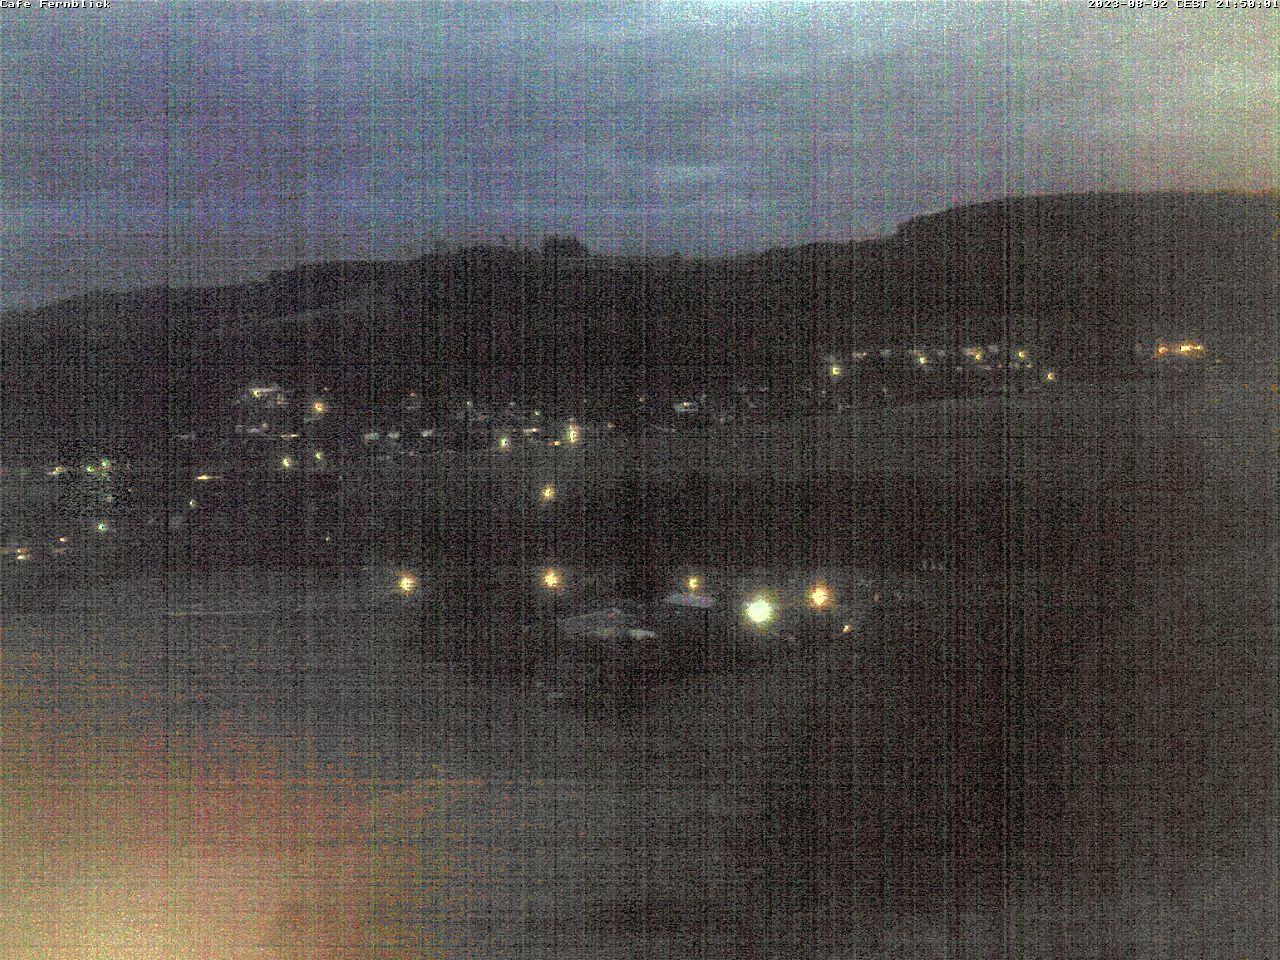 Webcam Skigebiet Willingen - Winterpark - Ettelsberg Panorama - Sauerland